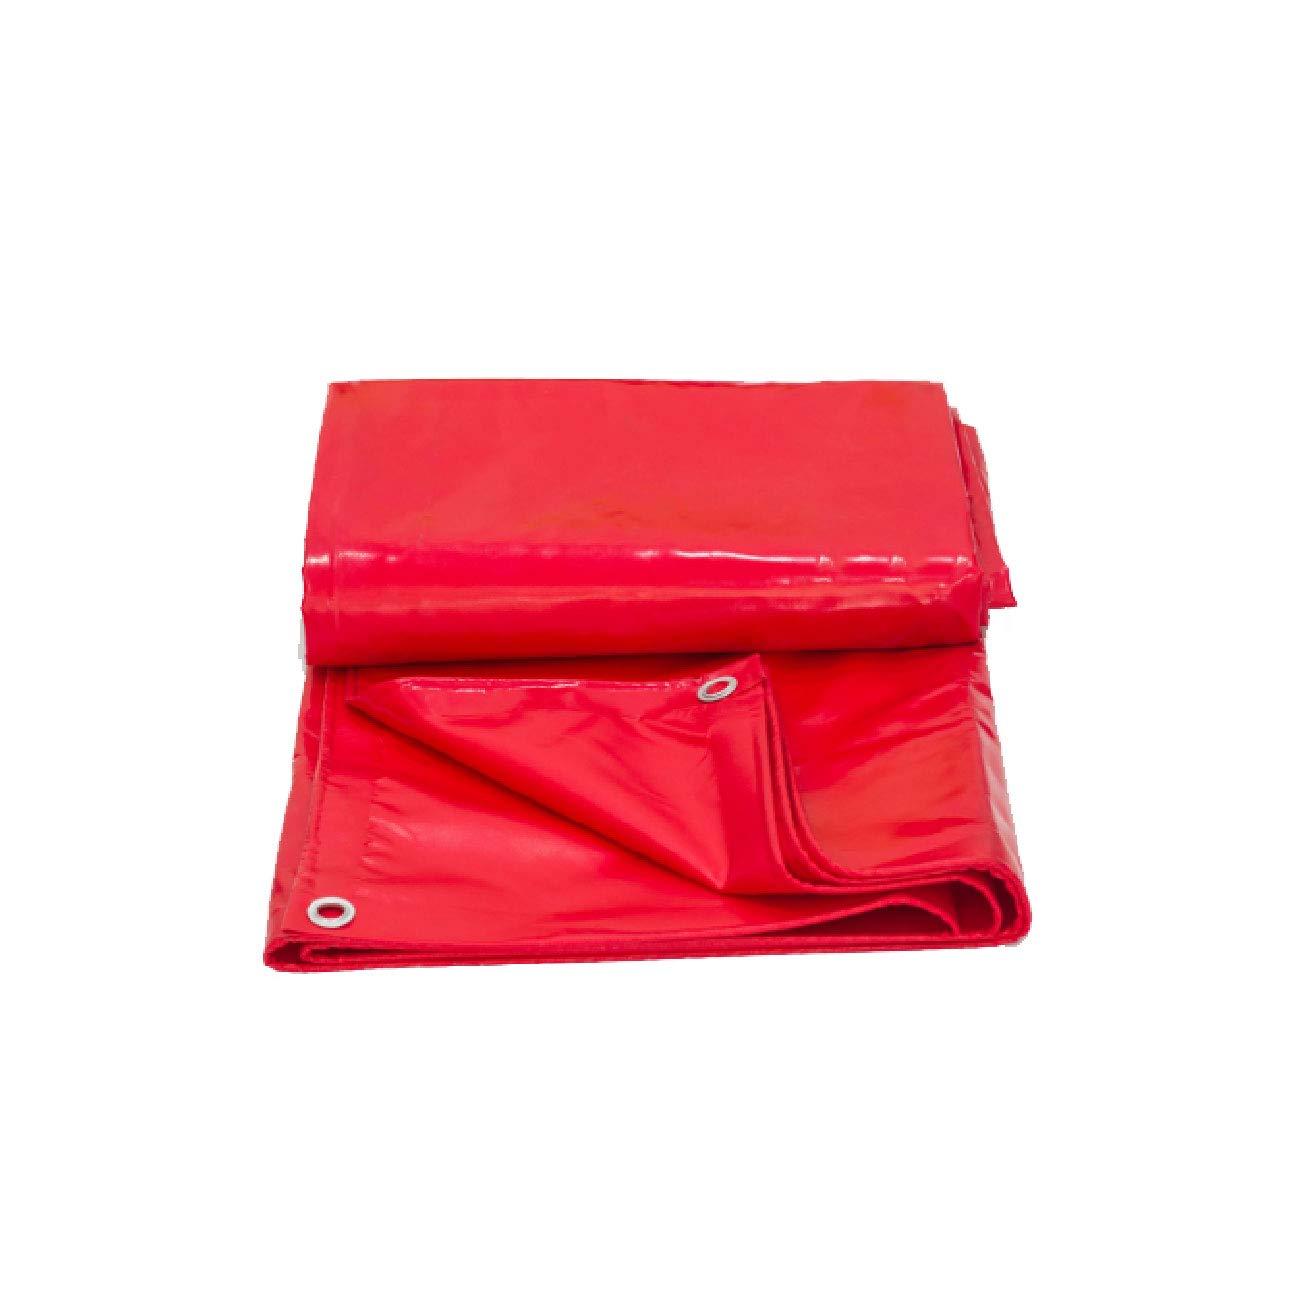 PVCナイフ擦り布プラスチック袋防水雨布布張り布3つの抗布トラックのターポリンマルチオプション 3*3m  B07JGKPL1W